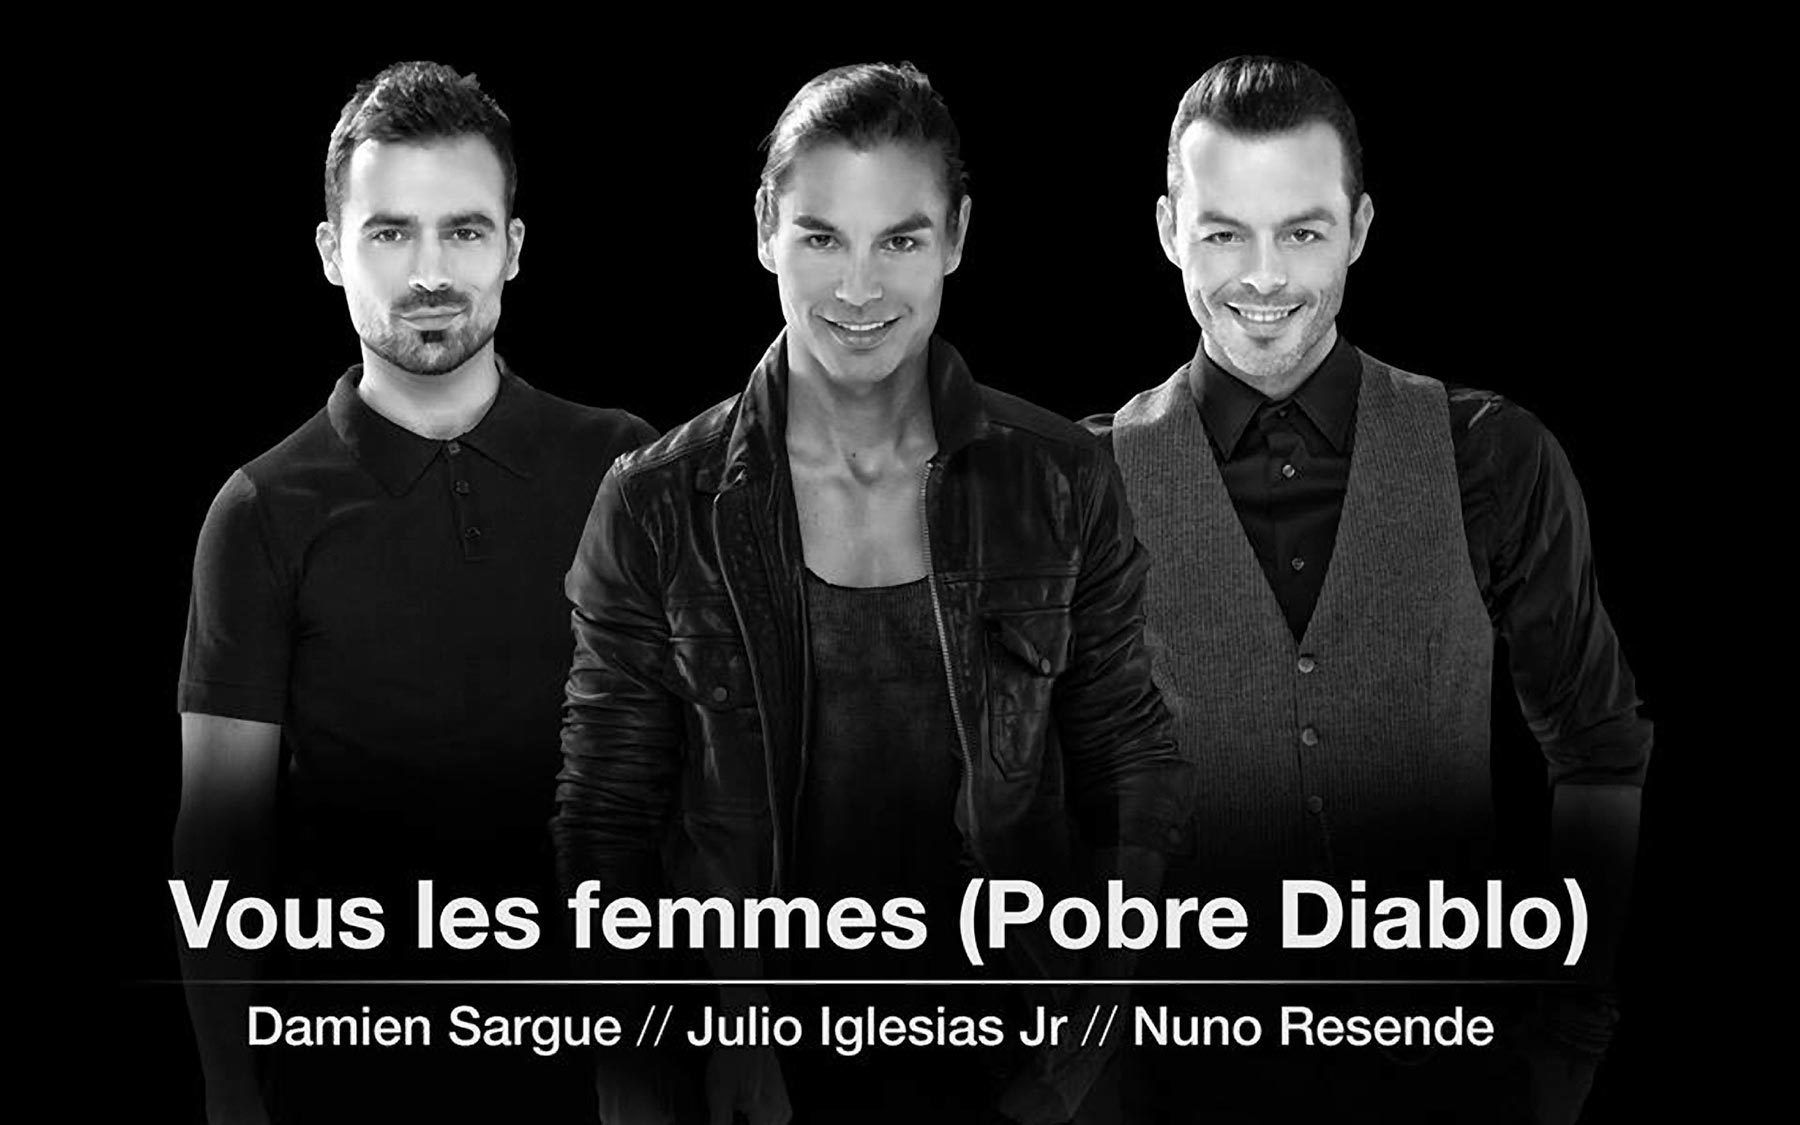 Damien Sargue, Julio Iglesias Jr., Nuno Resende